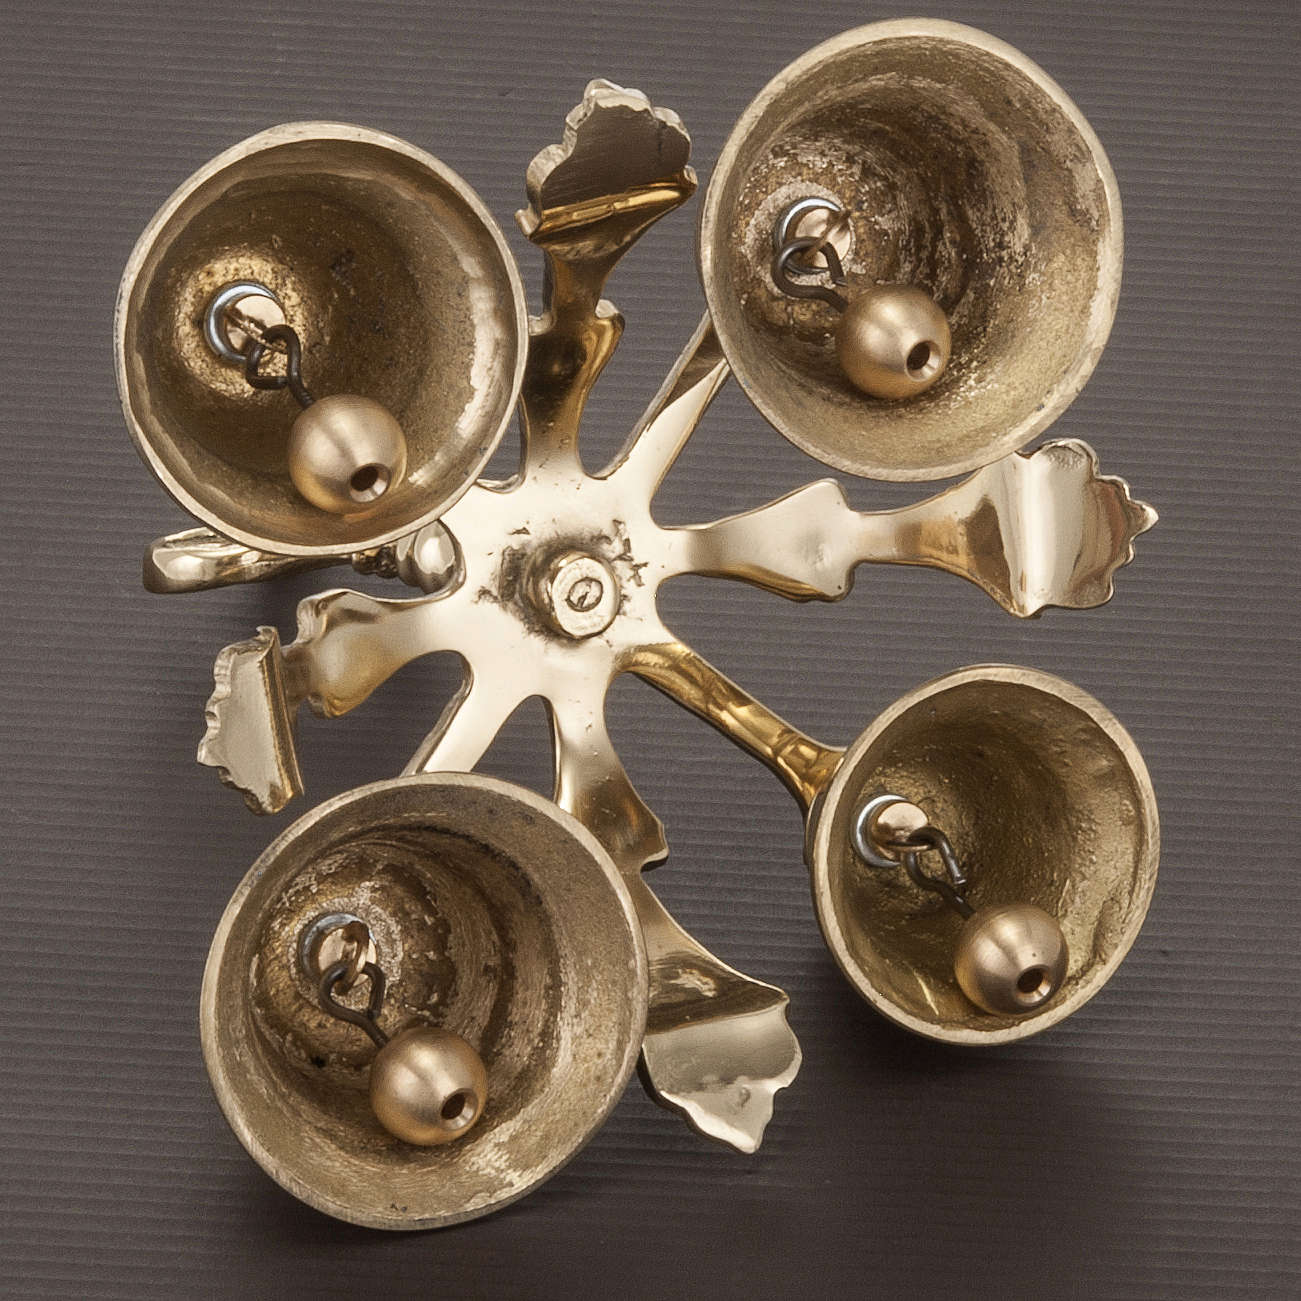 Church handbell four sounds decorated 3